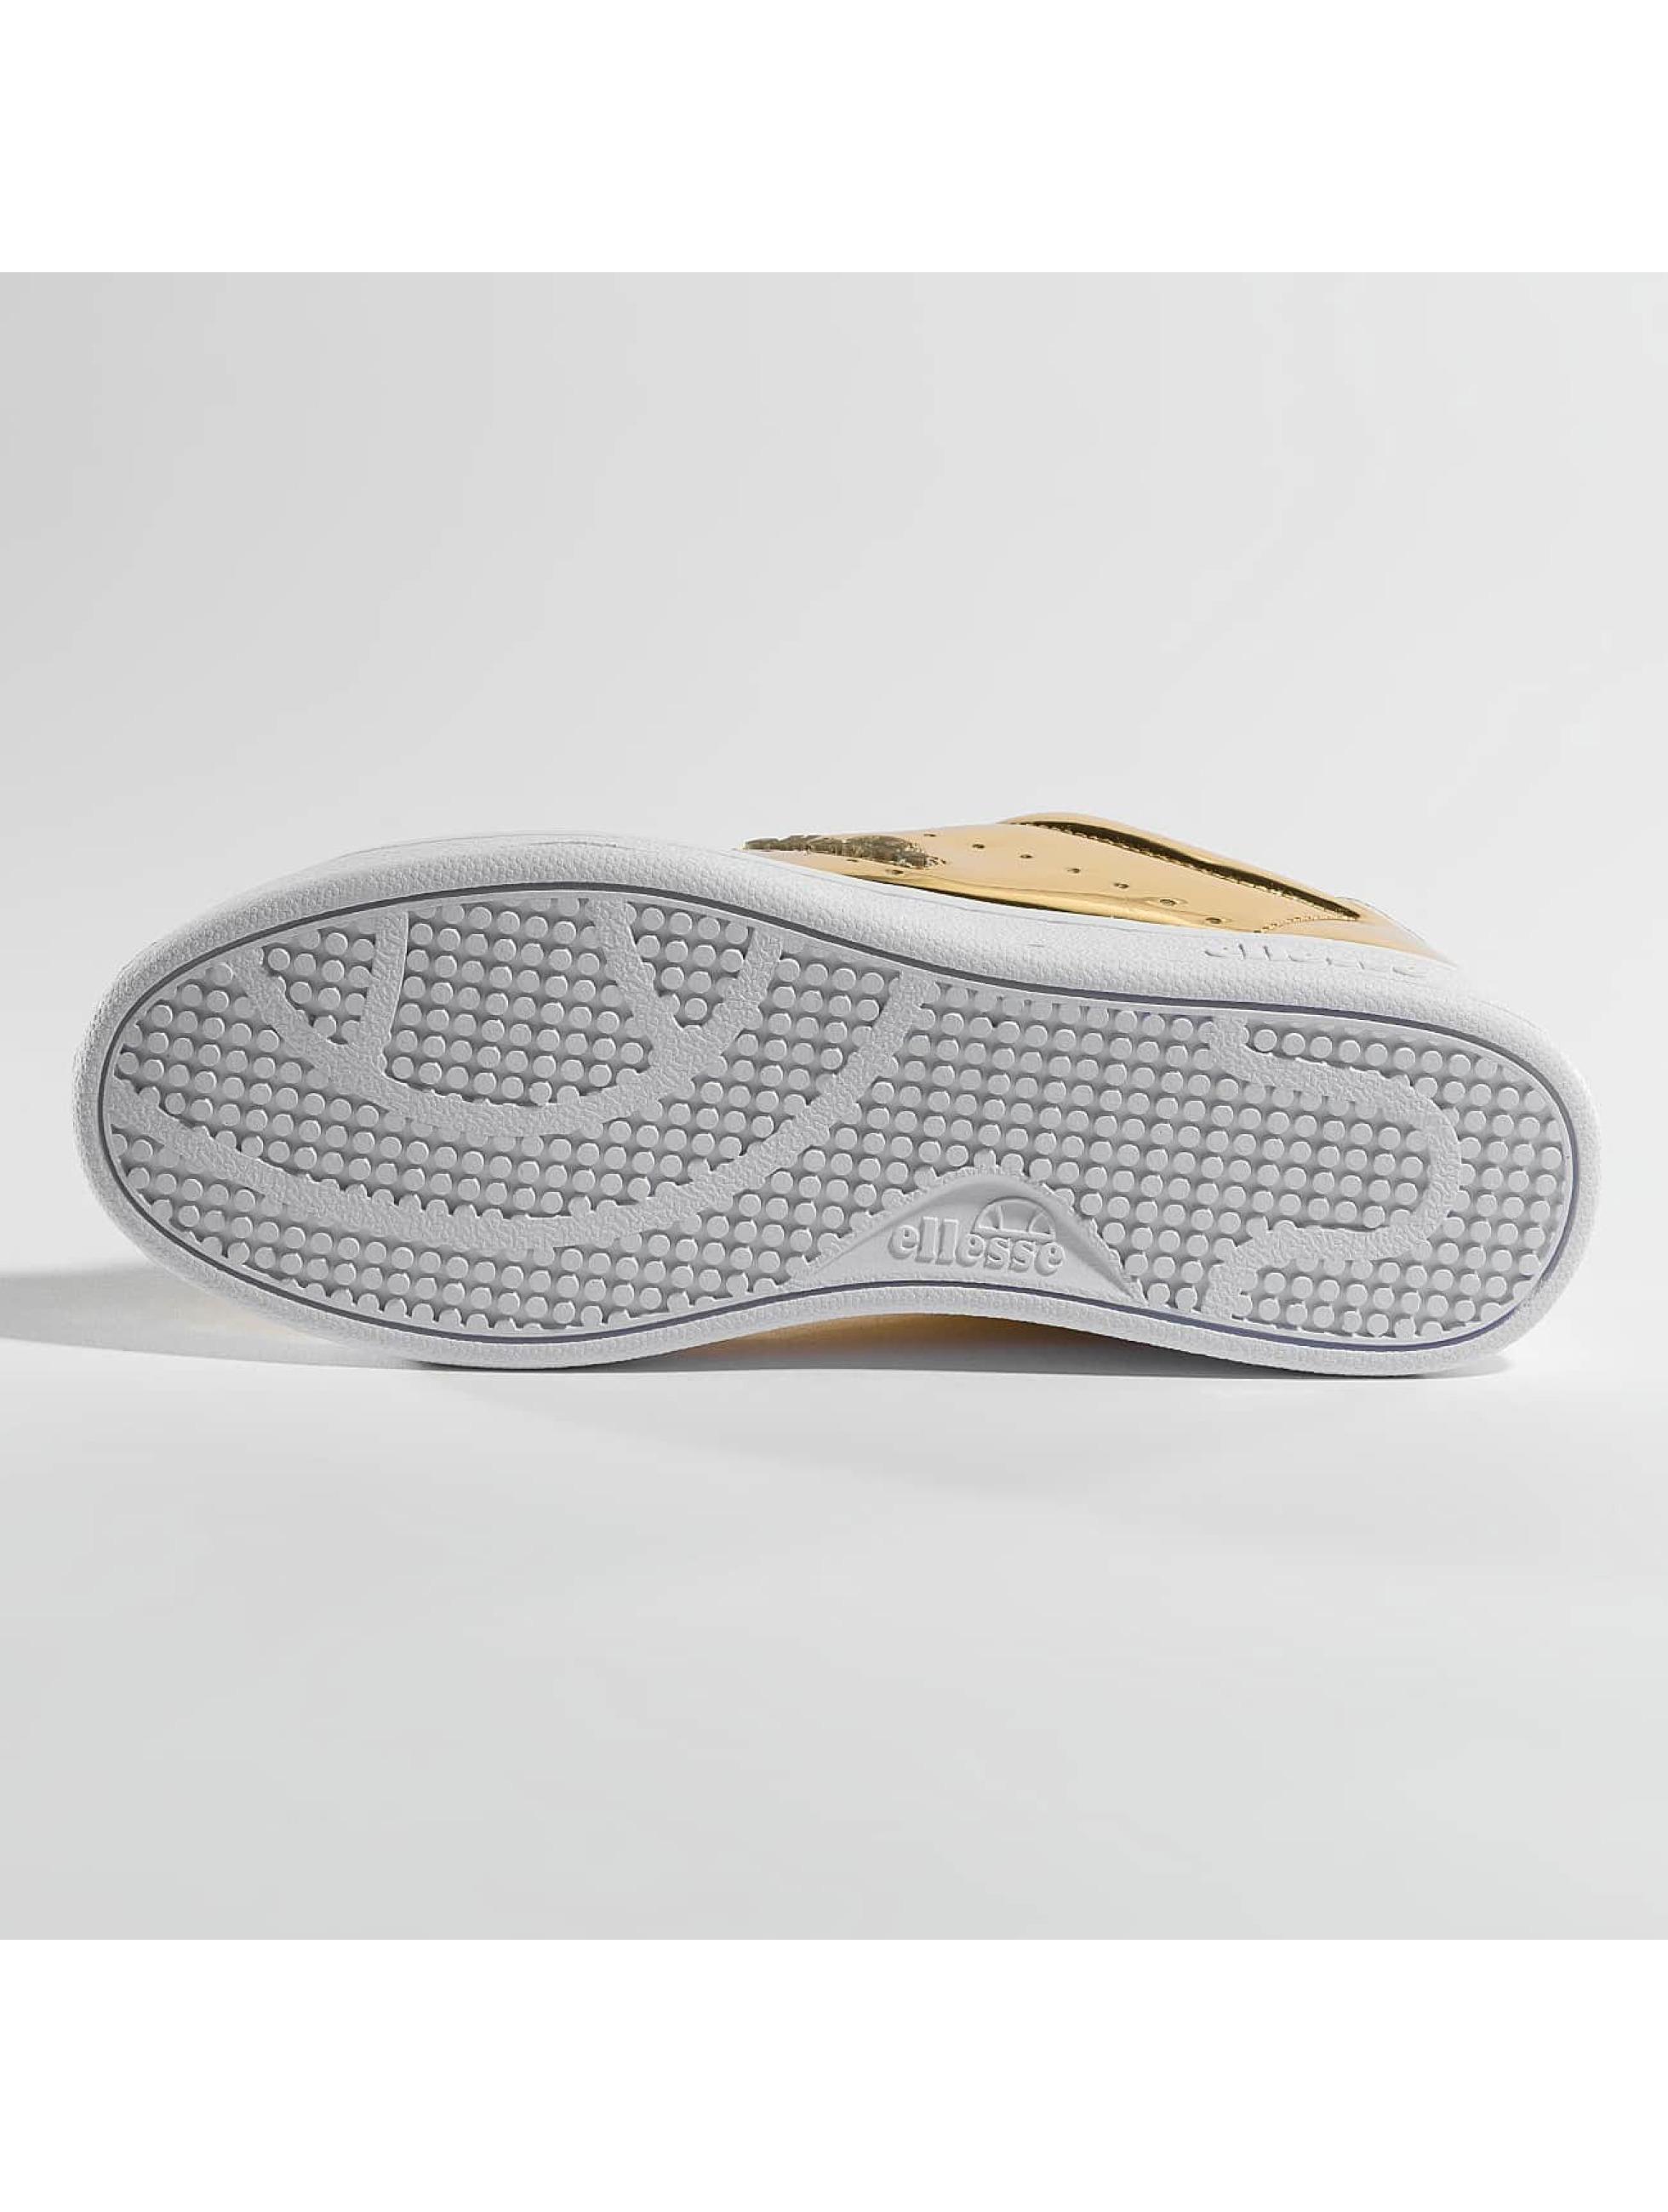 Ellesse Sneaker Heritage Anzia Metallic oro